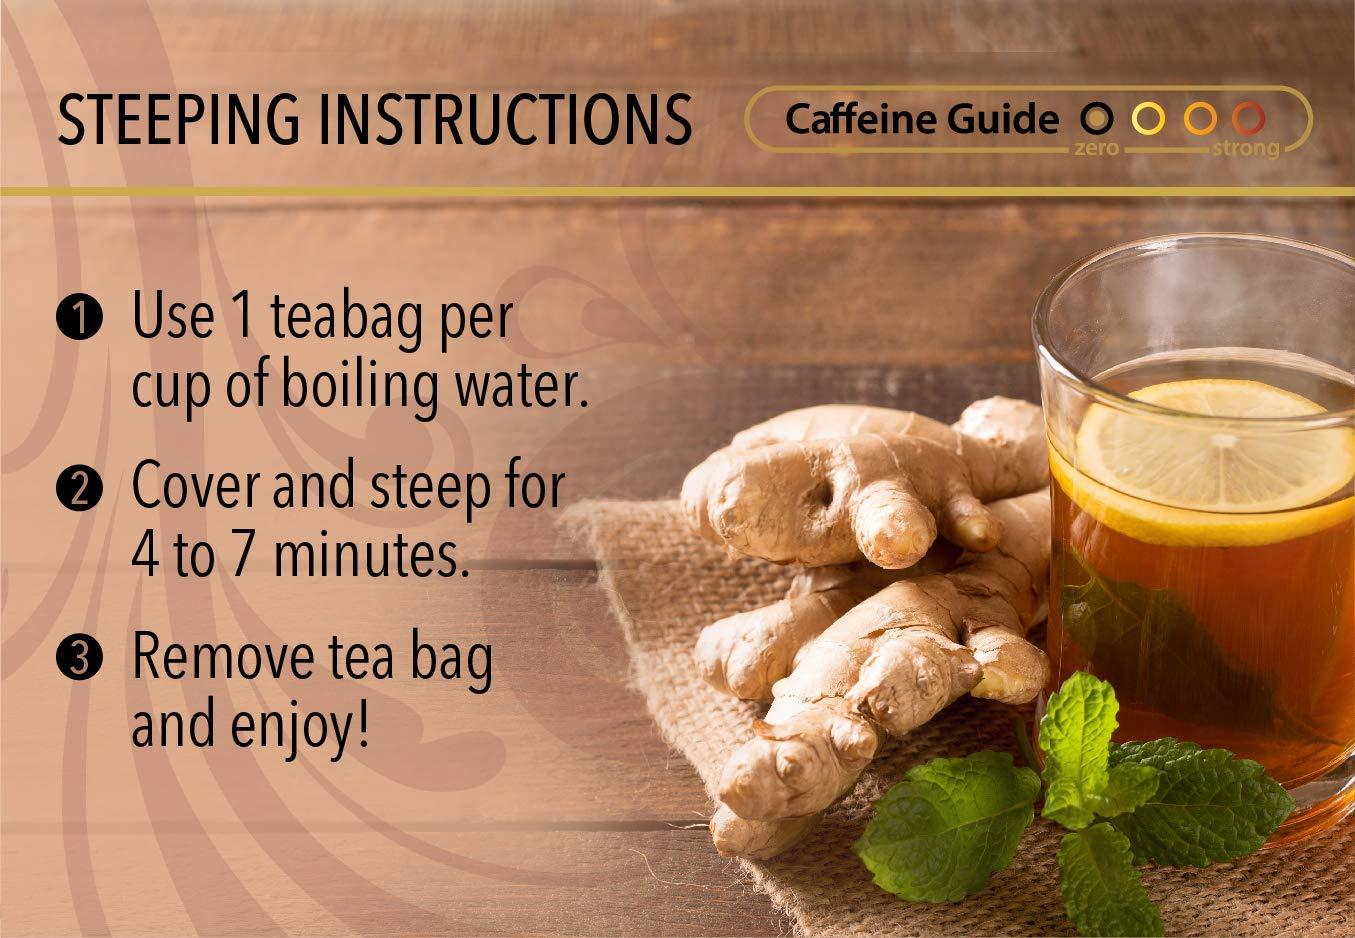 Buddha Teas Organic Turmeric Ginger Tea, 18 Bleach Tea Bags – Caffeine Free, Antioxidant, Antiviral, and Anti-Inflammatory, Immune Boosting Tea. Supports Digestion, No GMOs